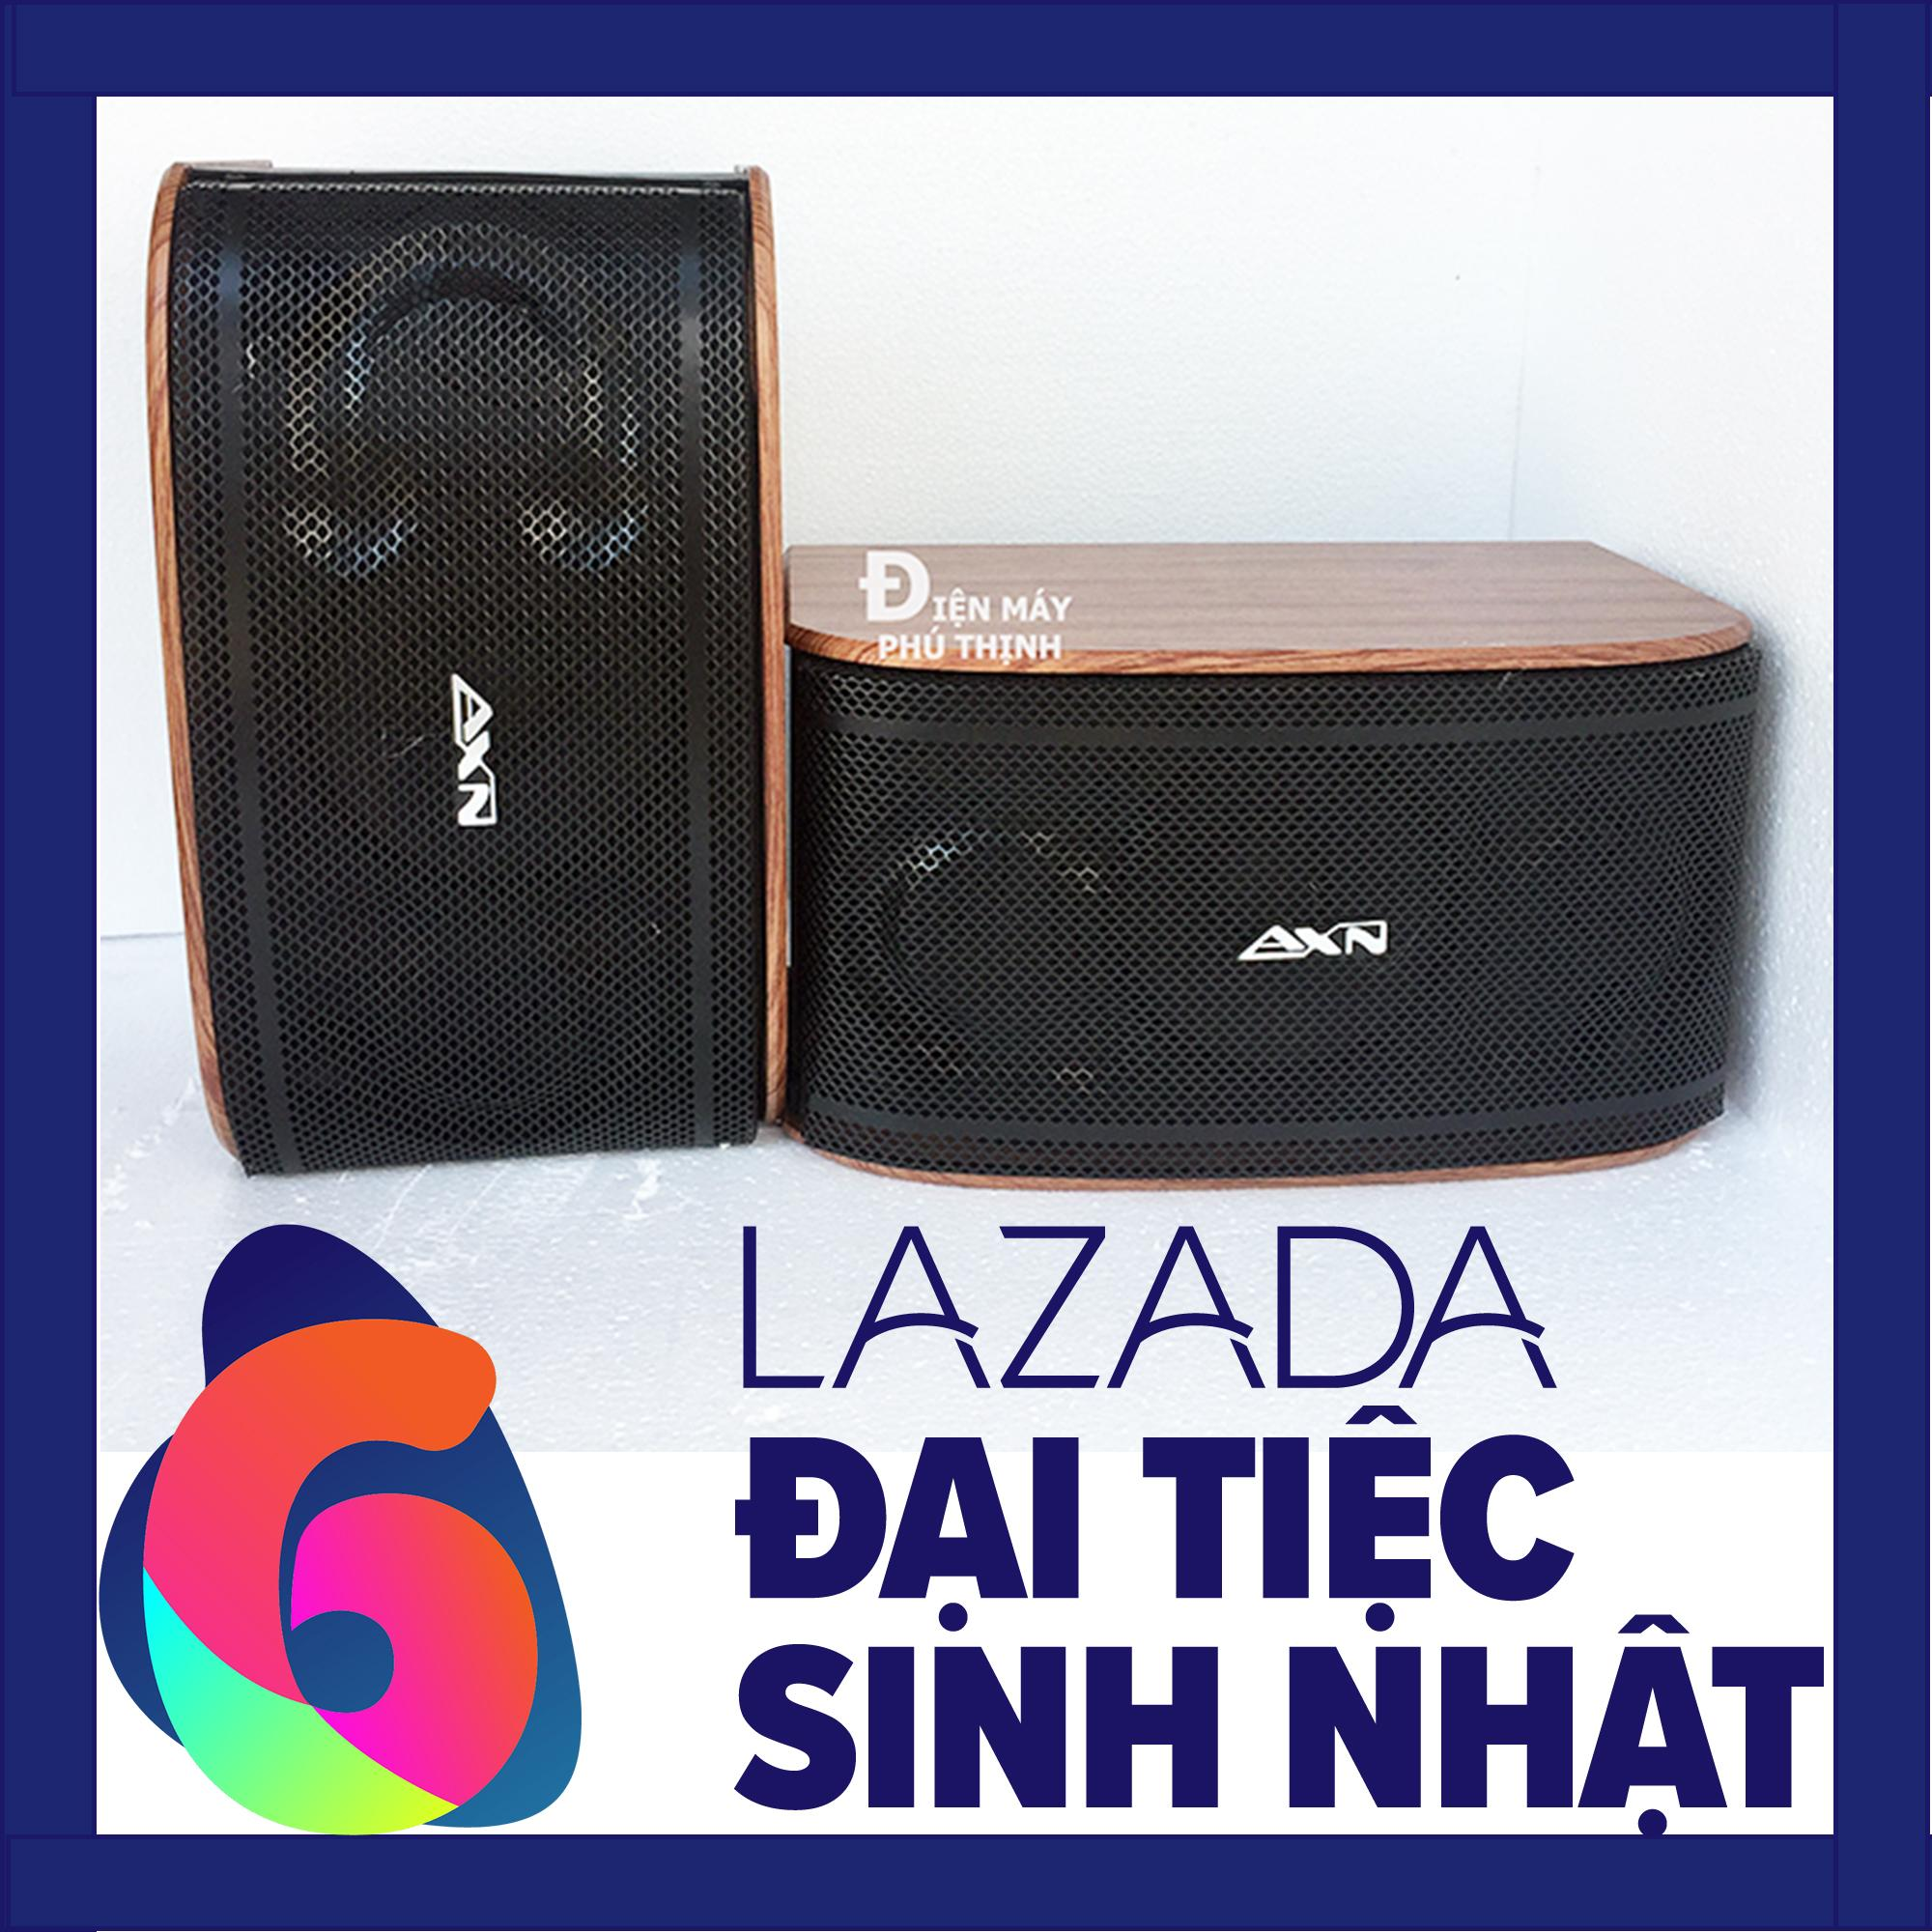 Loa Karaoke Nghe Nhạc Novio Pro Audio Karaoke Cực Hay Pt25T Mới Nhất